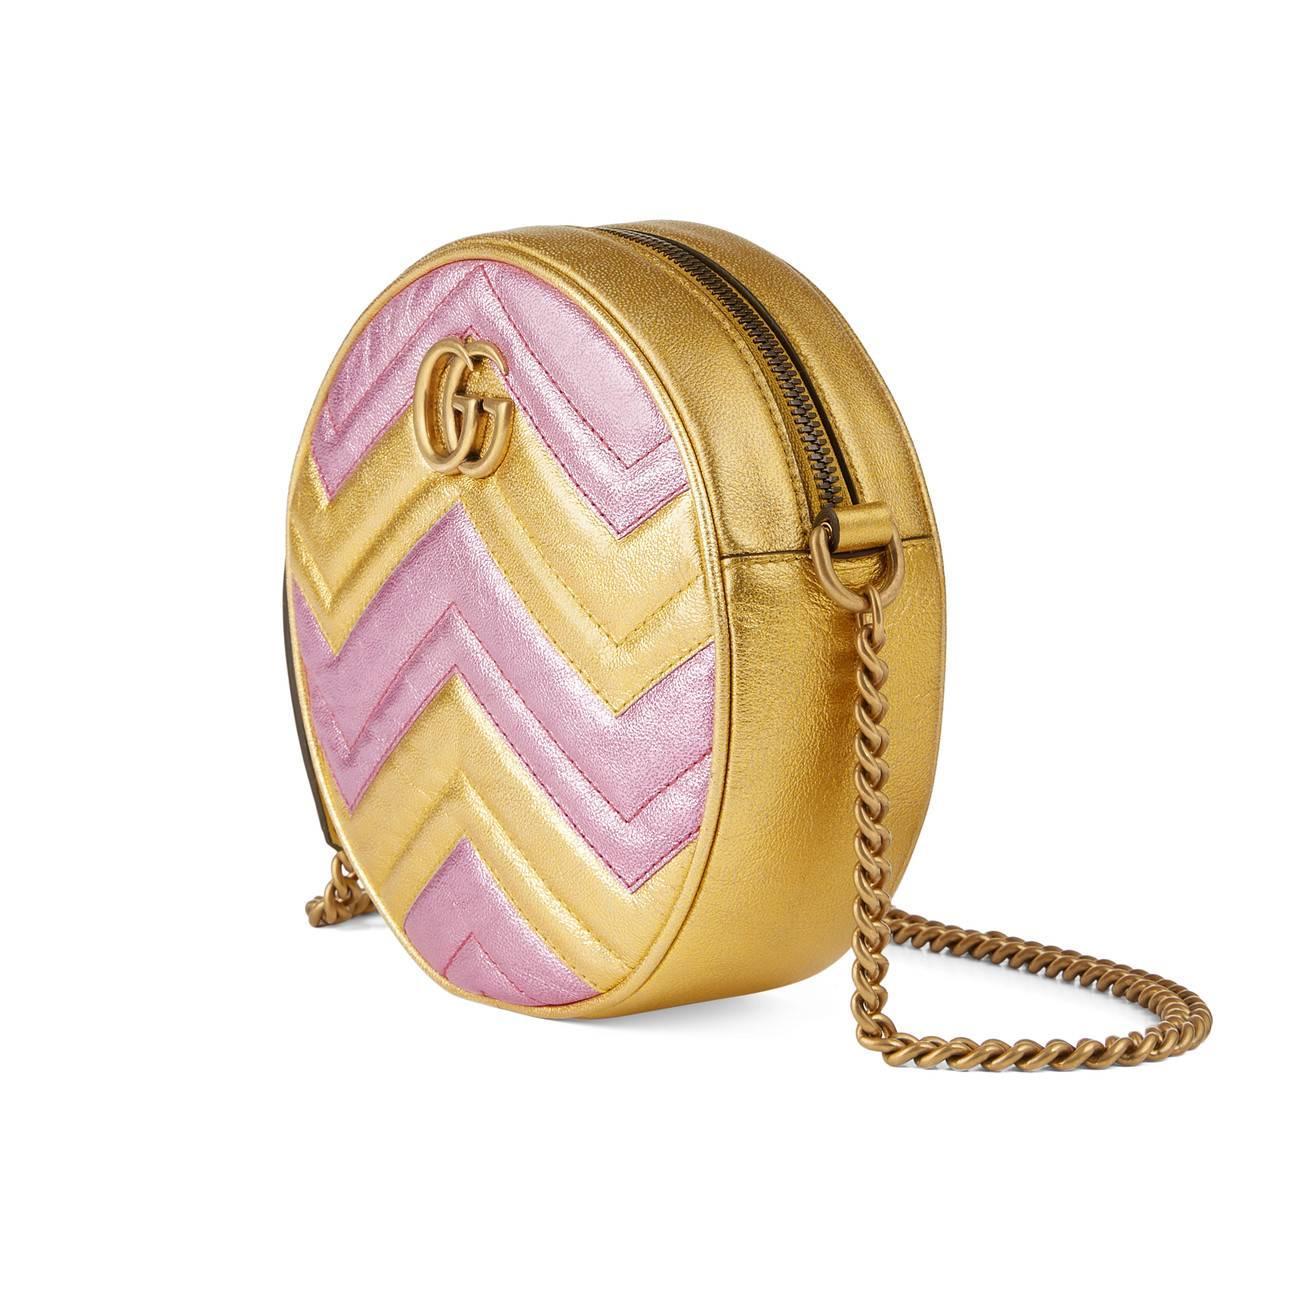 10935e2c7a0 Gucci - Metallic GG Marmont Mini Round Shoulder Bag - Lyst. View fullscreen